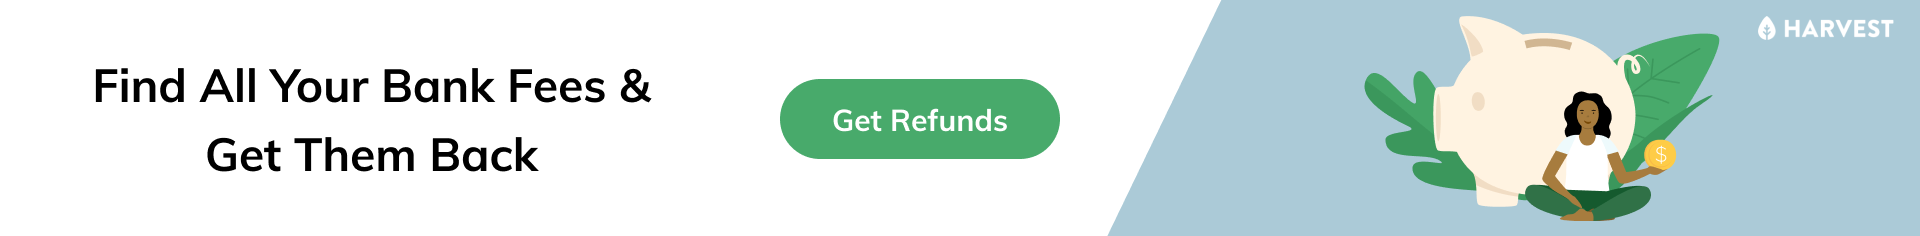 Get Bank Fee Refunds